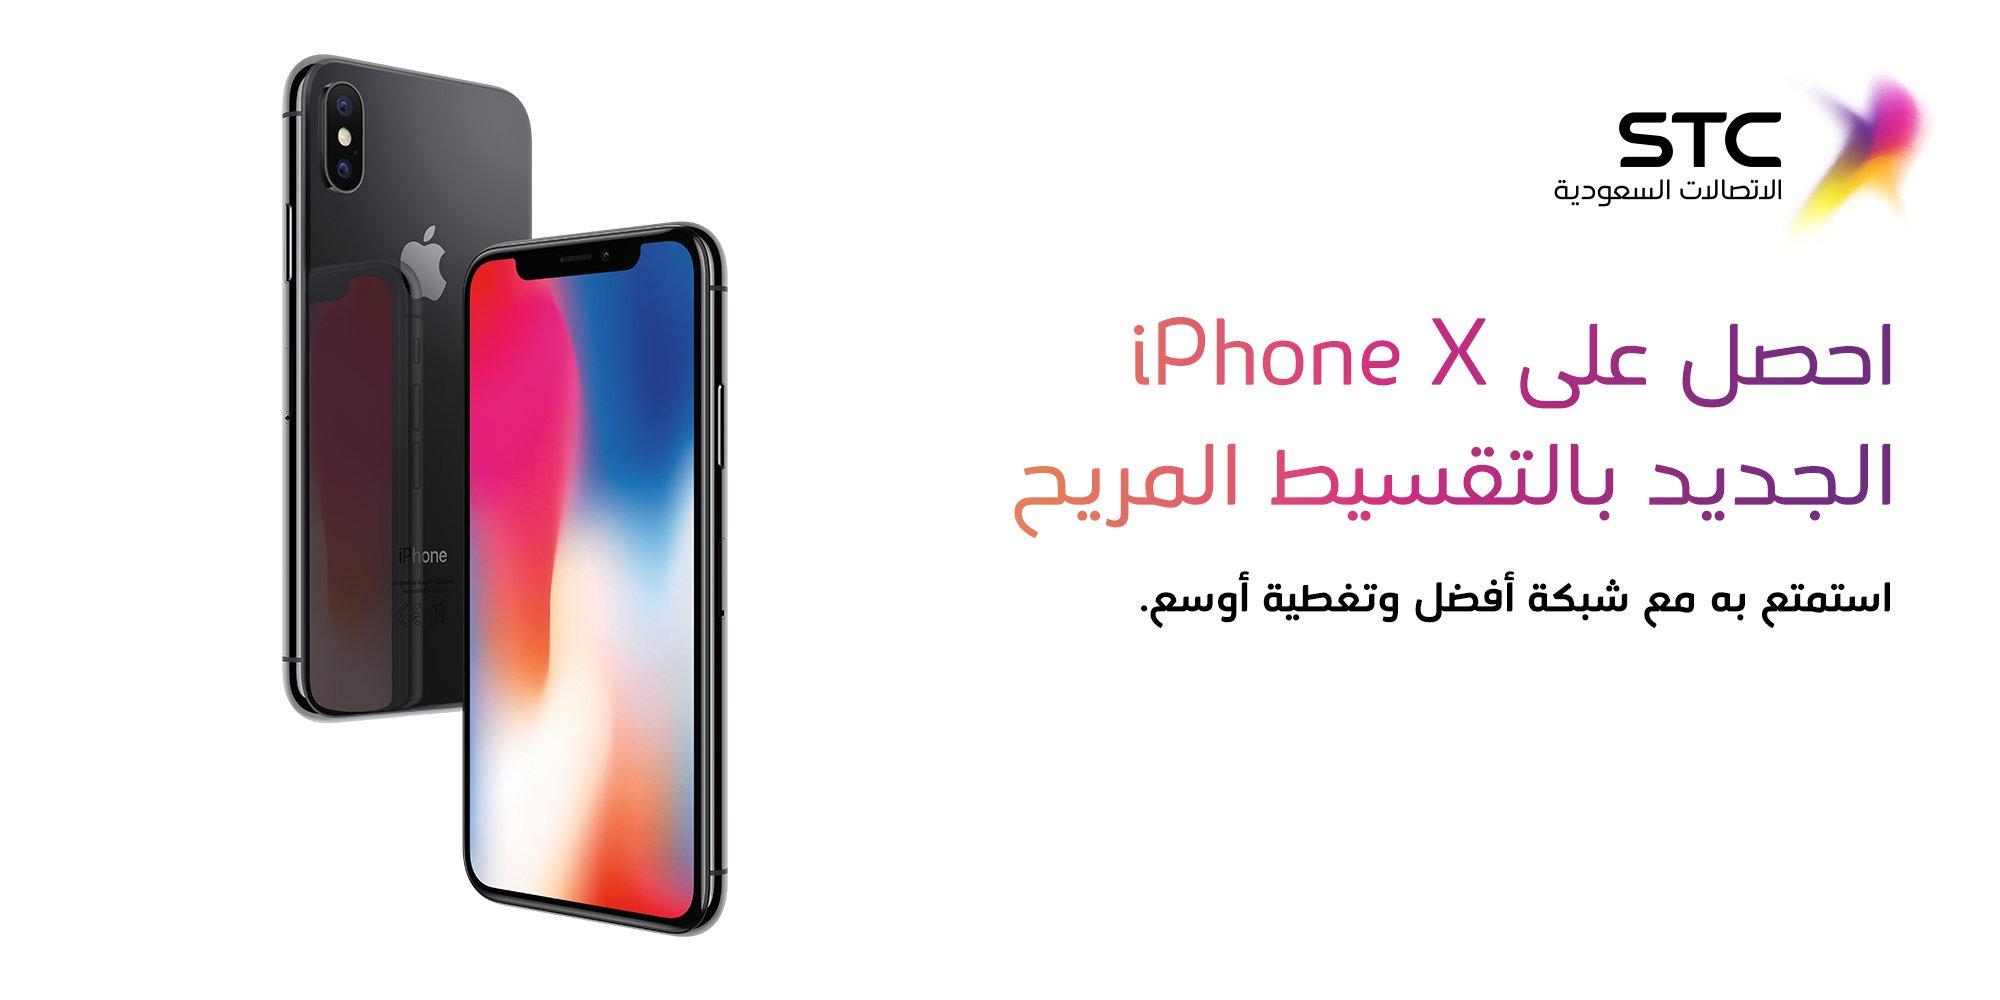 Stc السعودية On Twitter احصل على Iphone X الجديد بالتقسيط المريح للاطلاع على الأسعار والباقات من خلال الرابط Https T Co 7vgq5bdatf